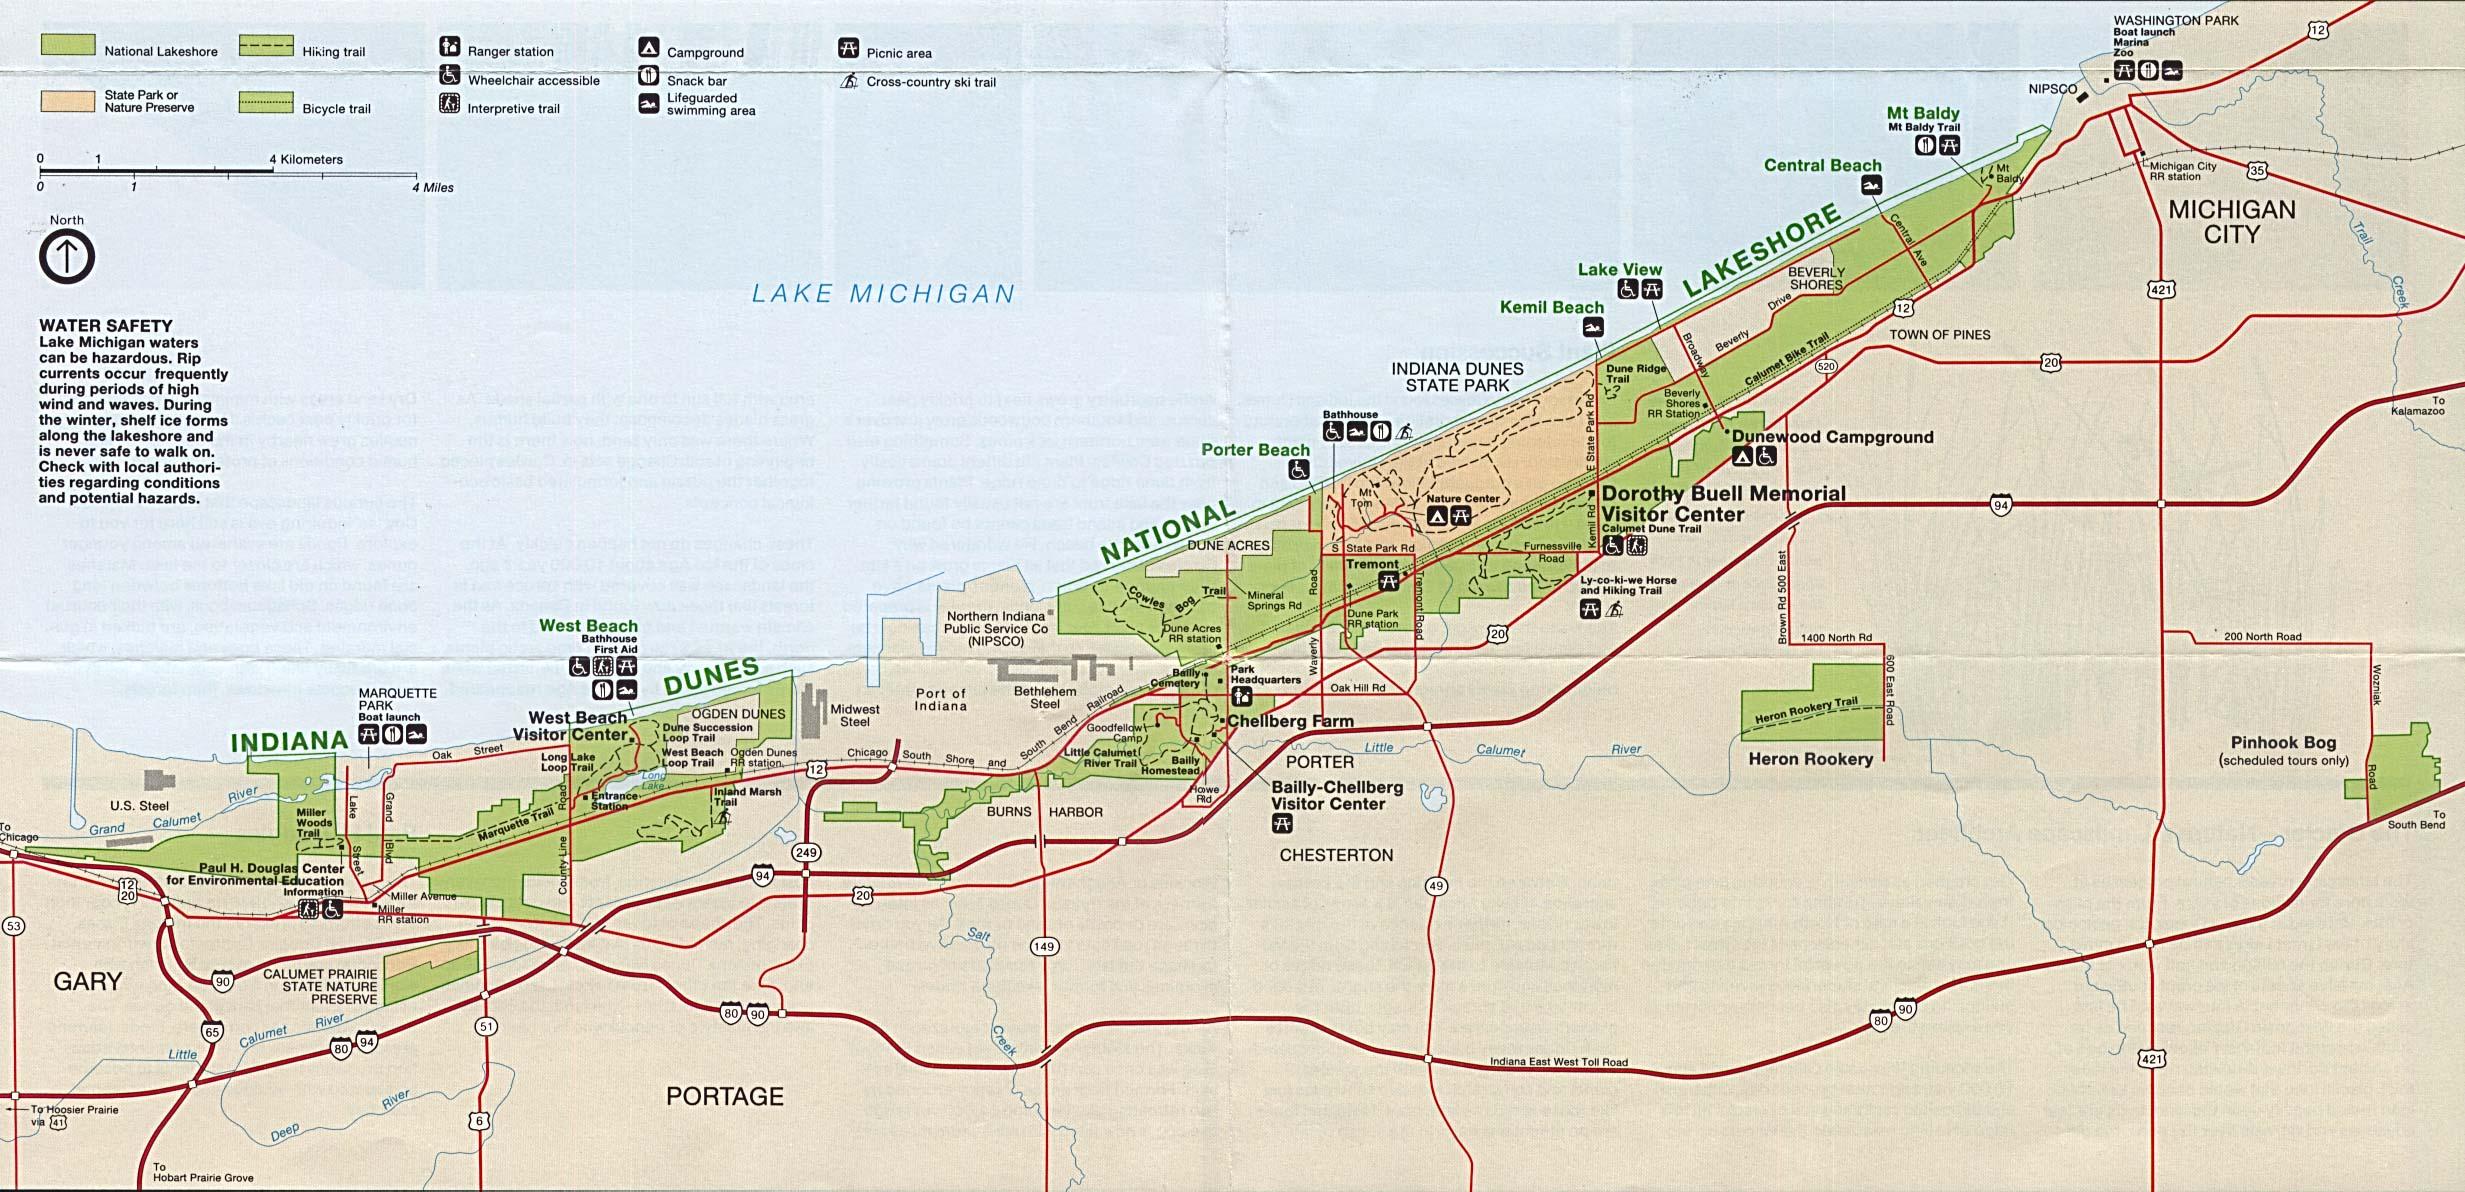 indiana_dunes_national_lakeshore_park_map.jpg